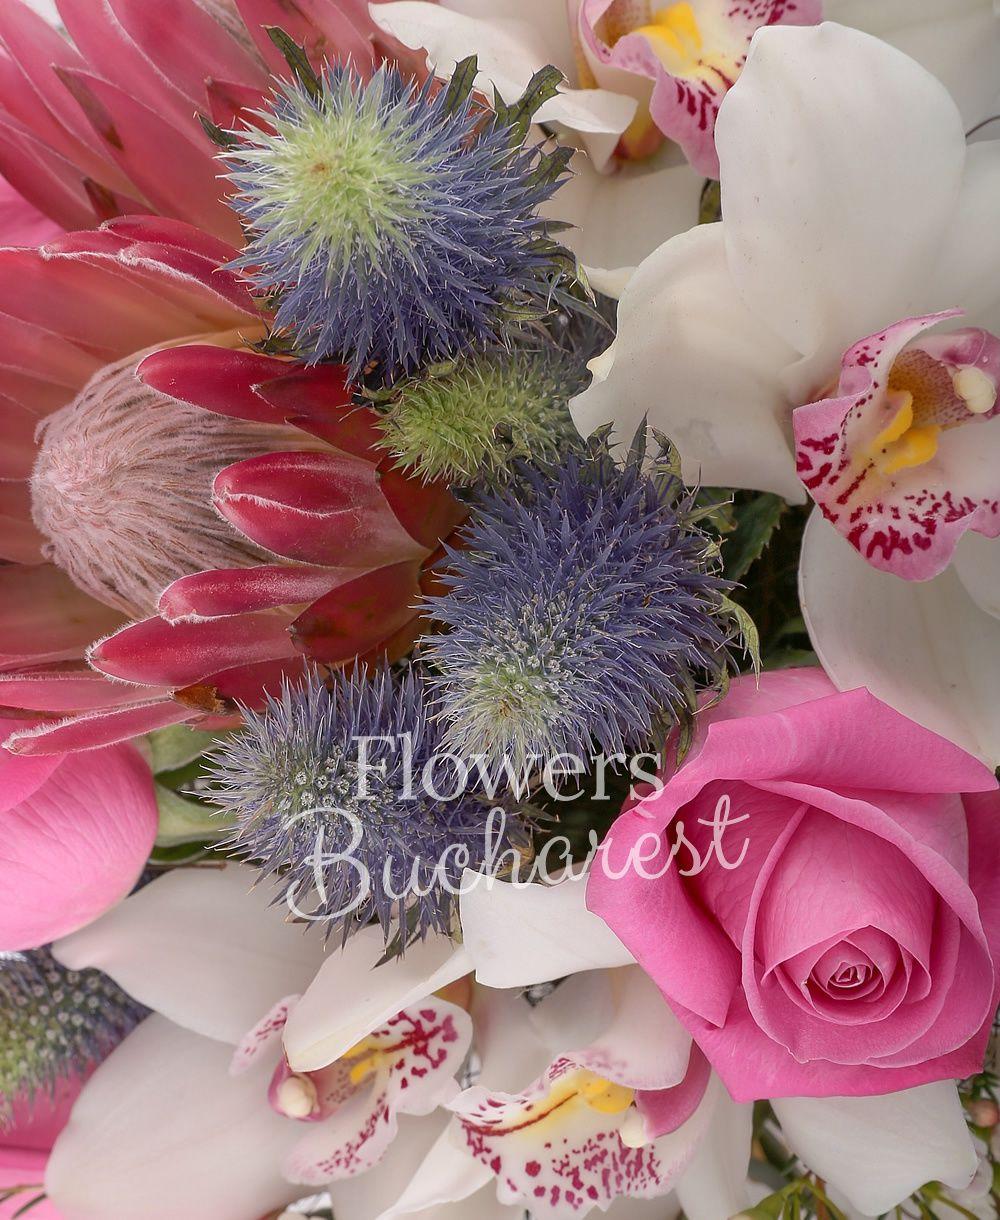 5 cyclam roses, 2 pink gerbera, 2 proteea, 2 leucadendron, 2 eryngium, white cymbidium, greenery